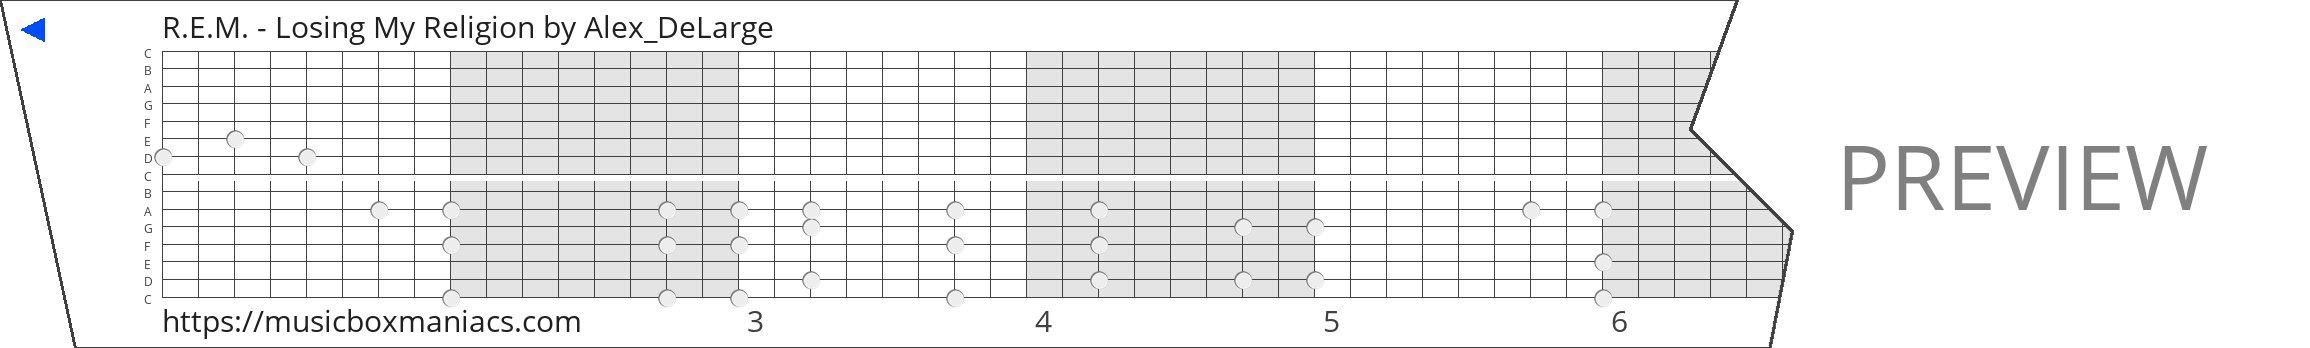 R.E.M. - Losing My Religion 15 note music box paper strip